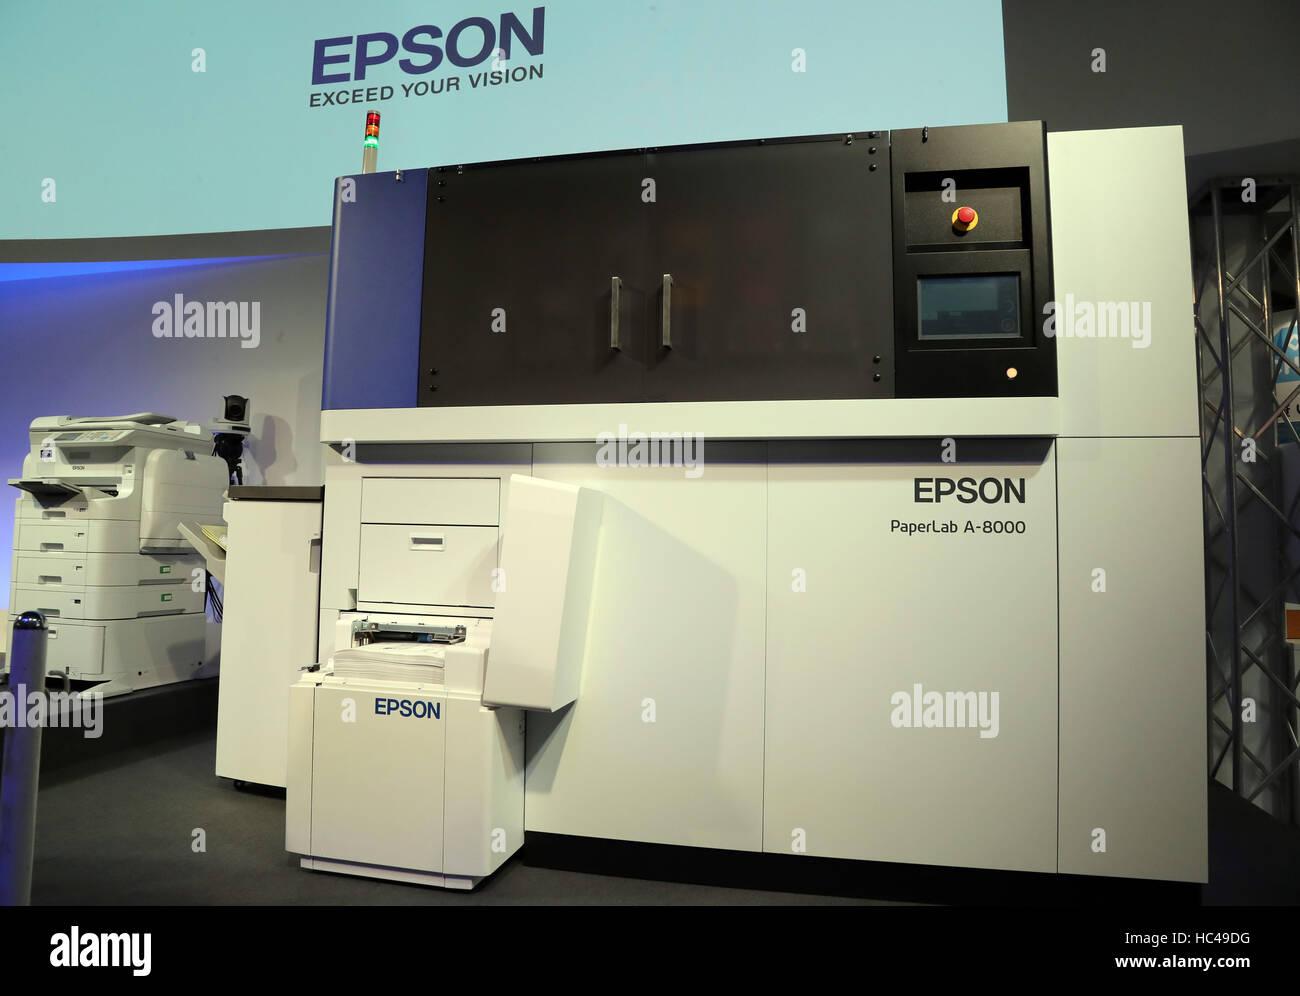 Tokyo, Japan  8th Dec, 2016  Japanese printer giant Epson